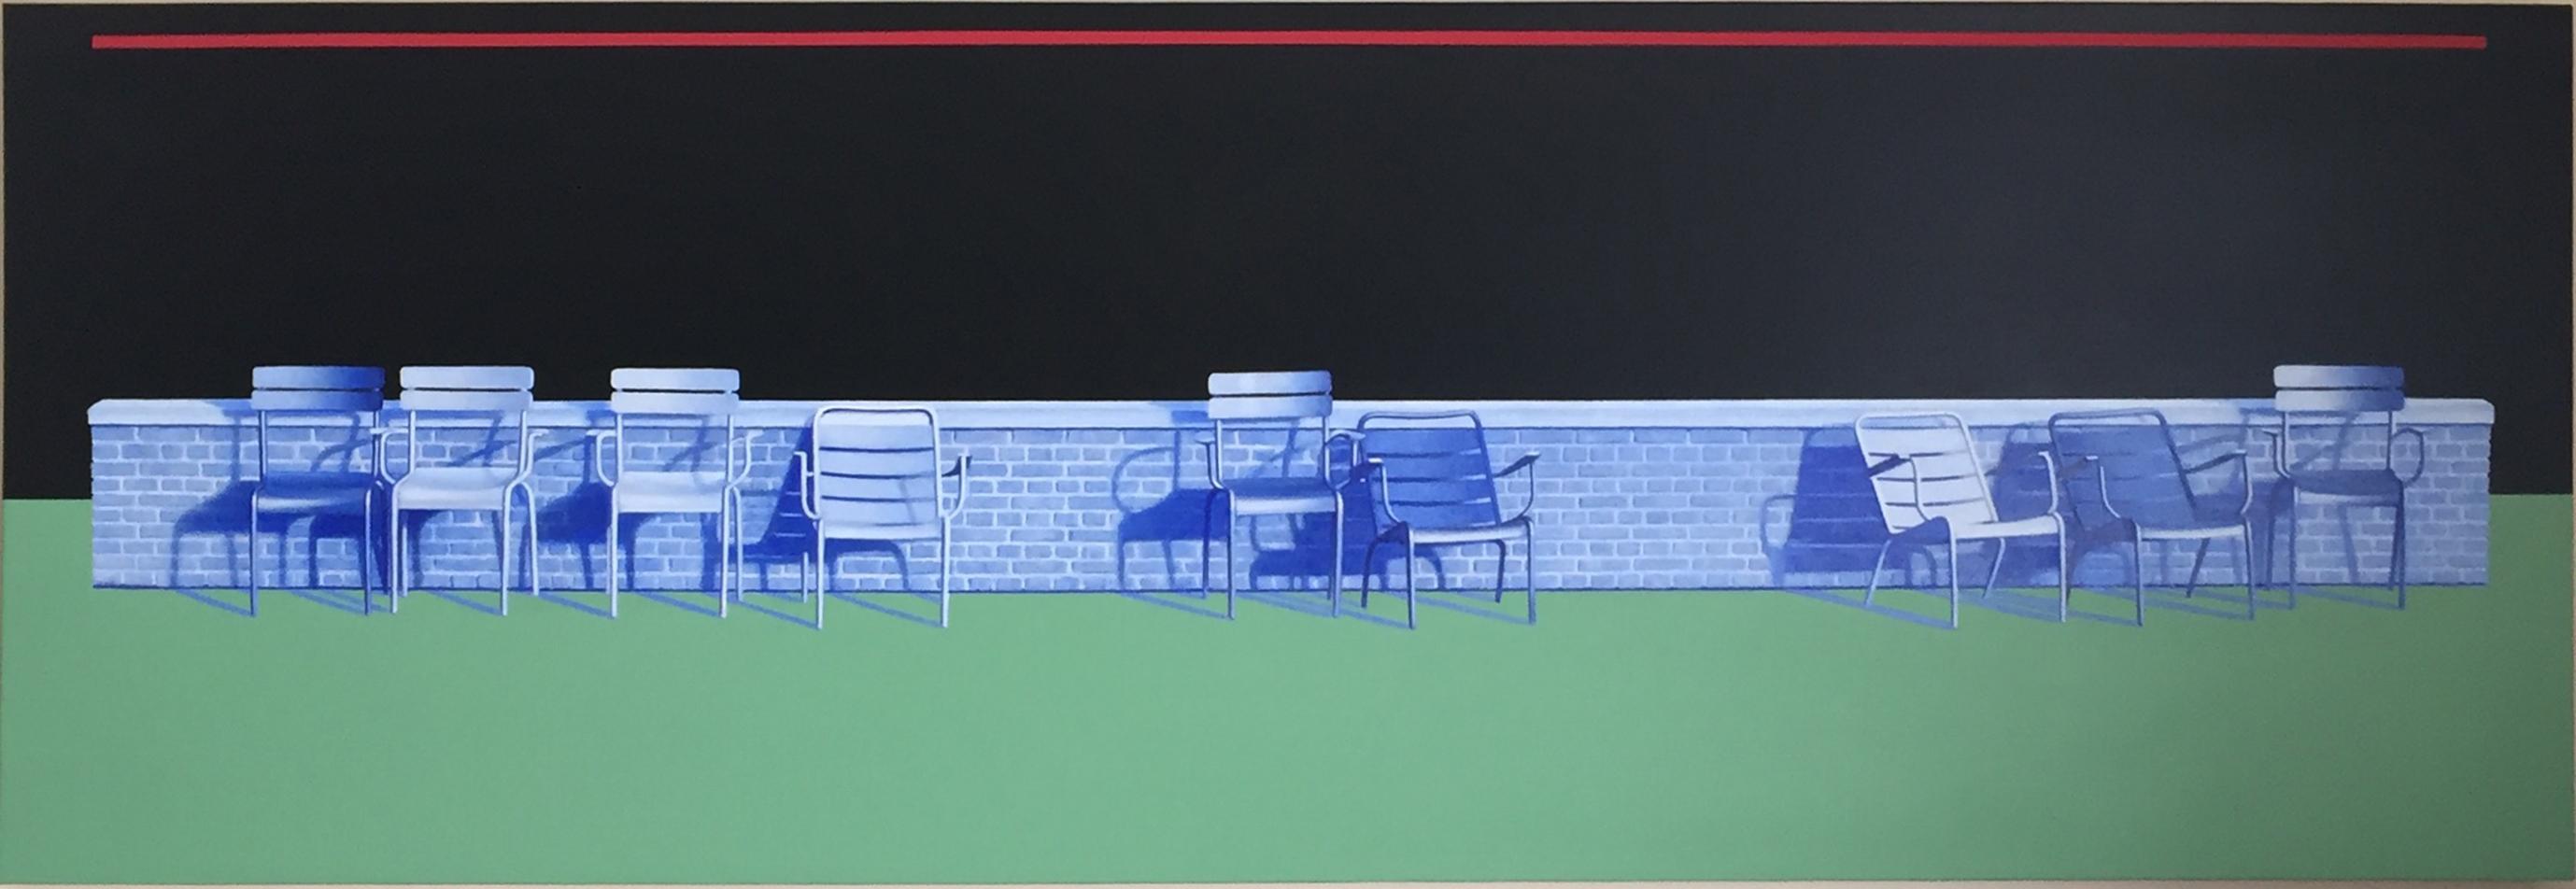 Chairs 2017 (20 x 60)